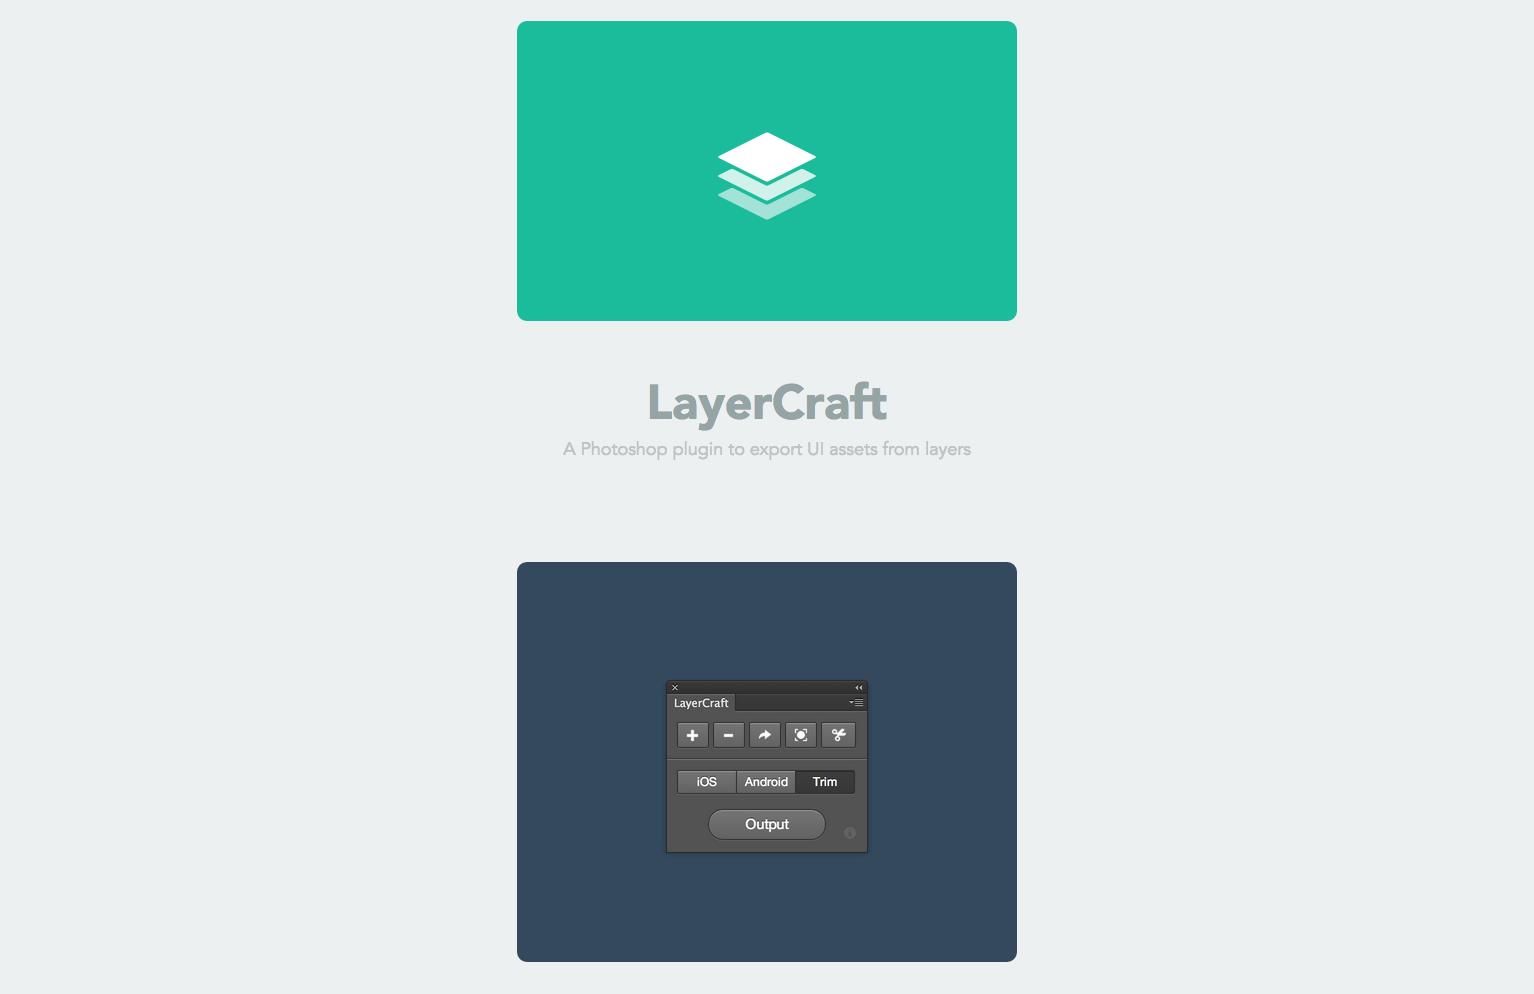 layercraft | web-crunch.com